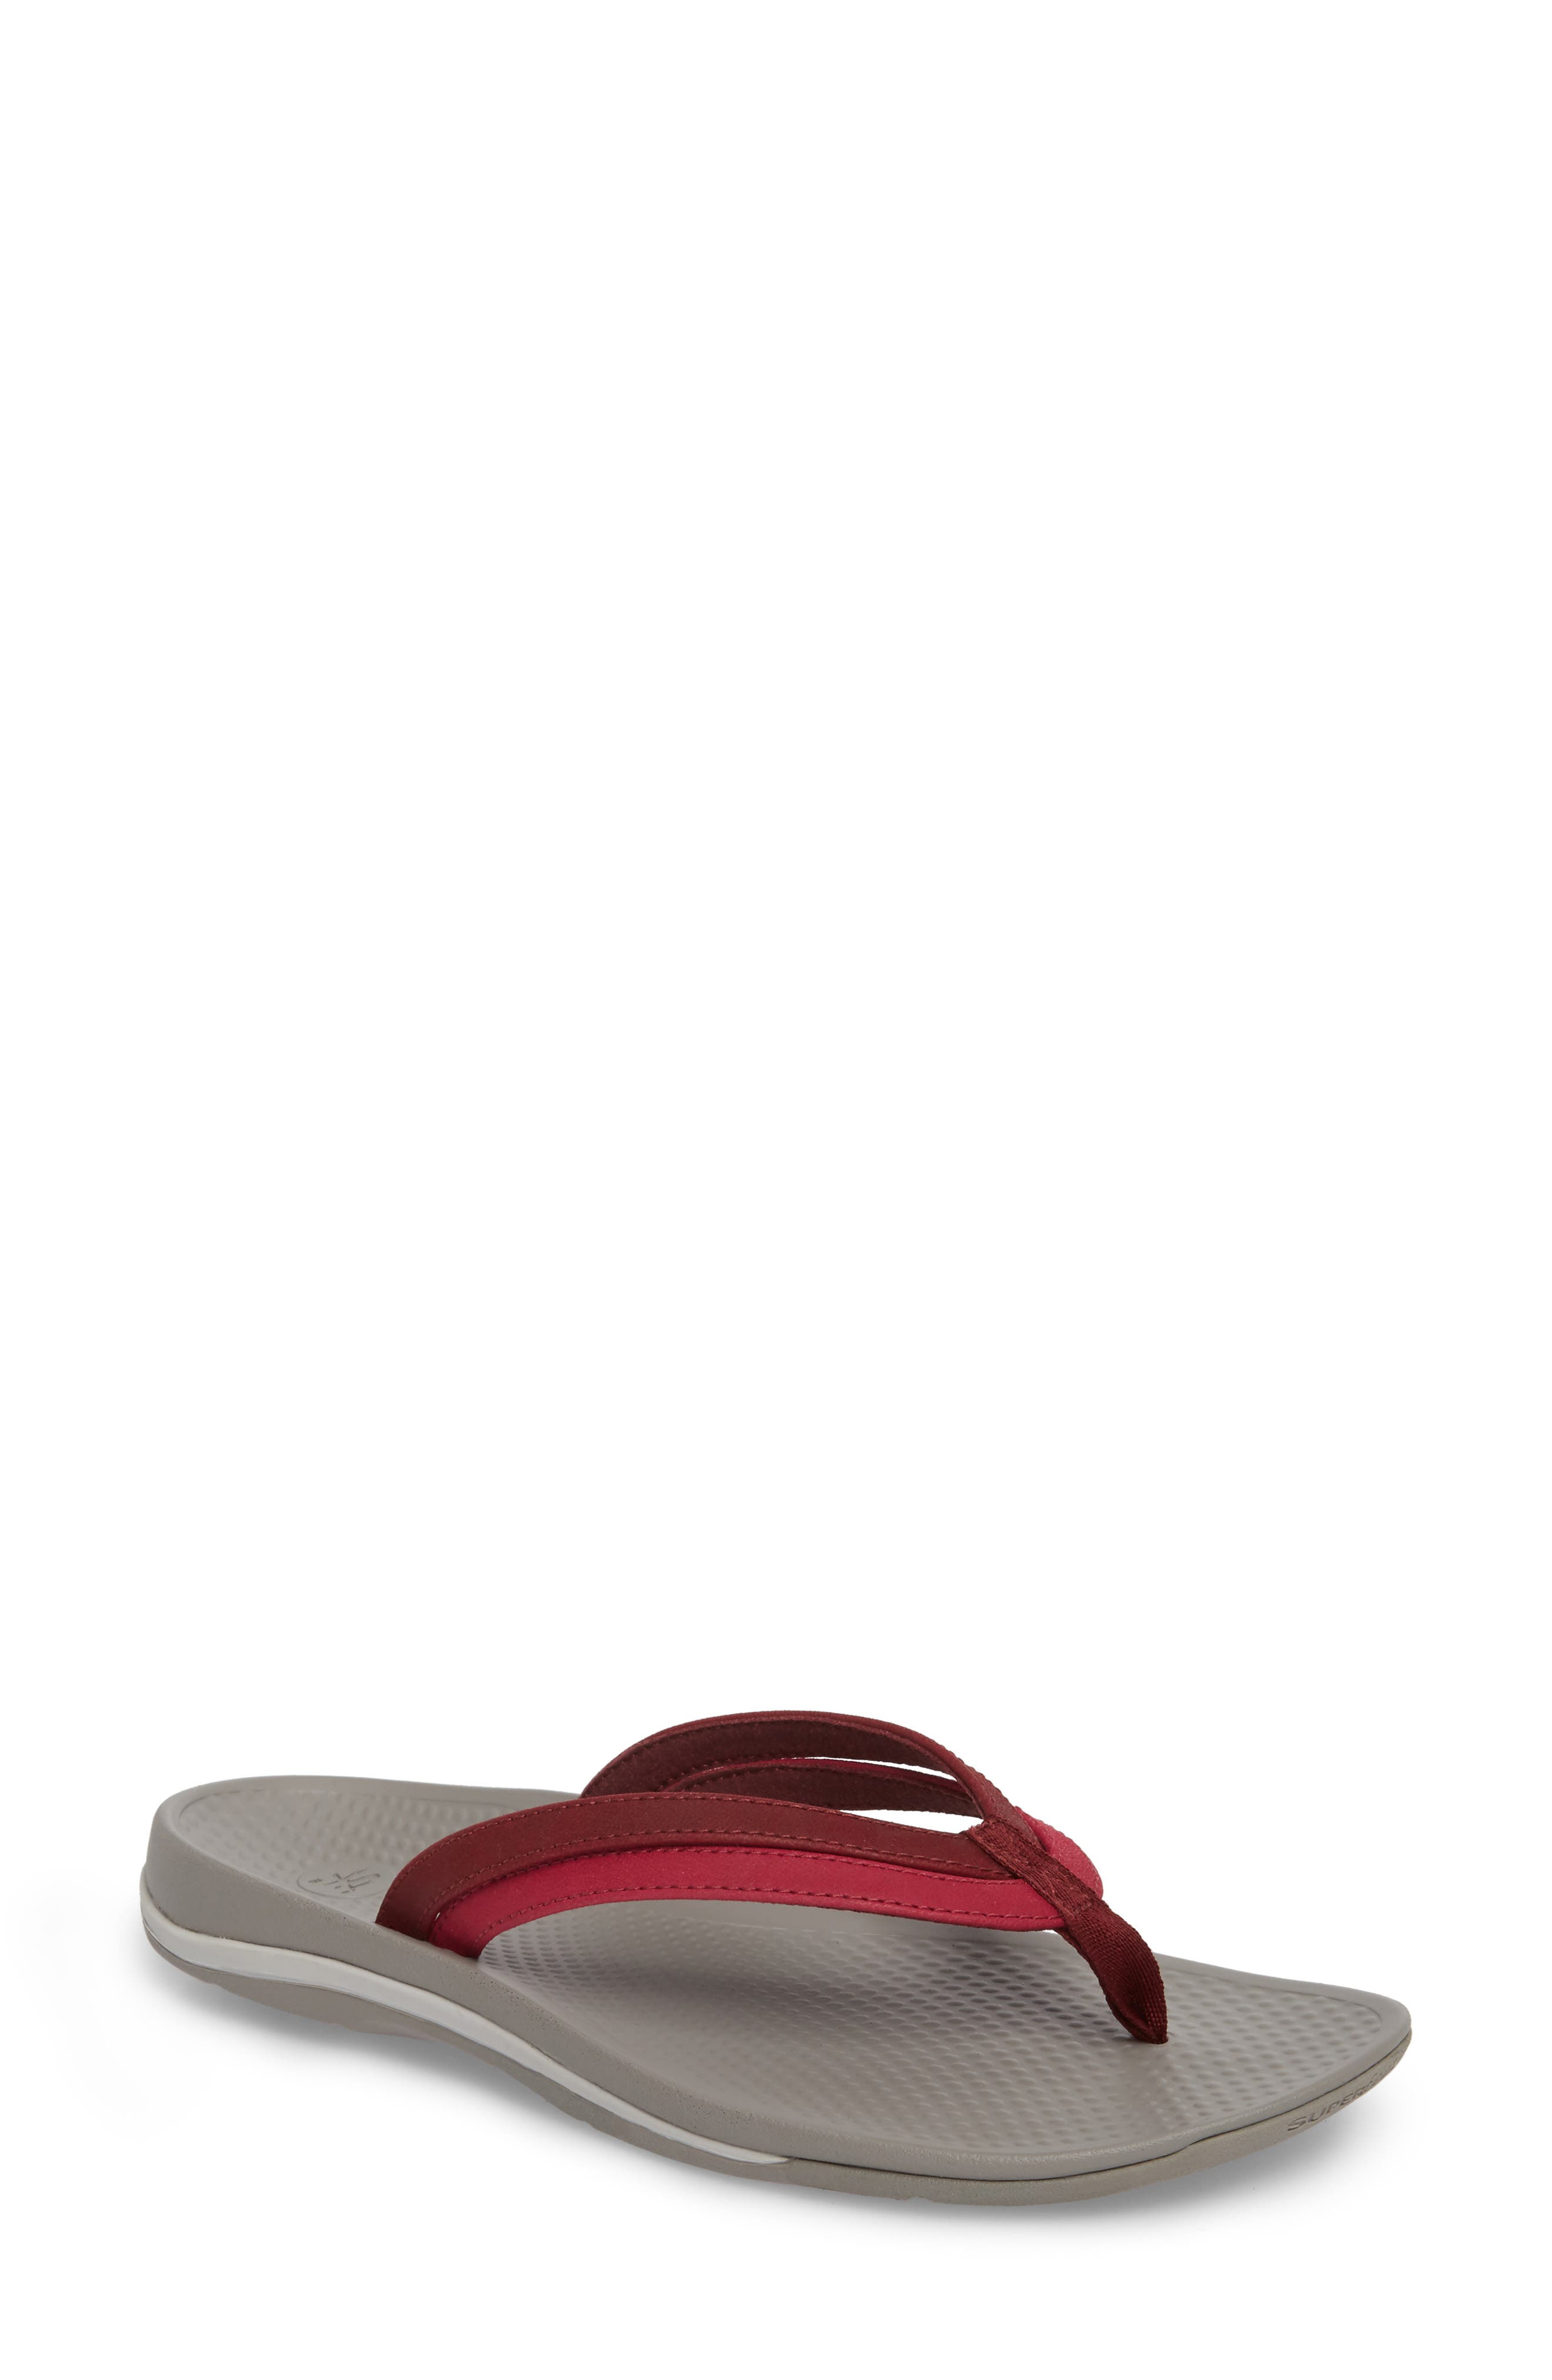 Rose Flip Flop,                             Main thumbnail 1, color,                             Red Faux Leather